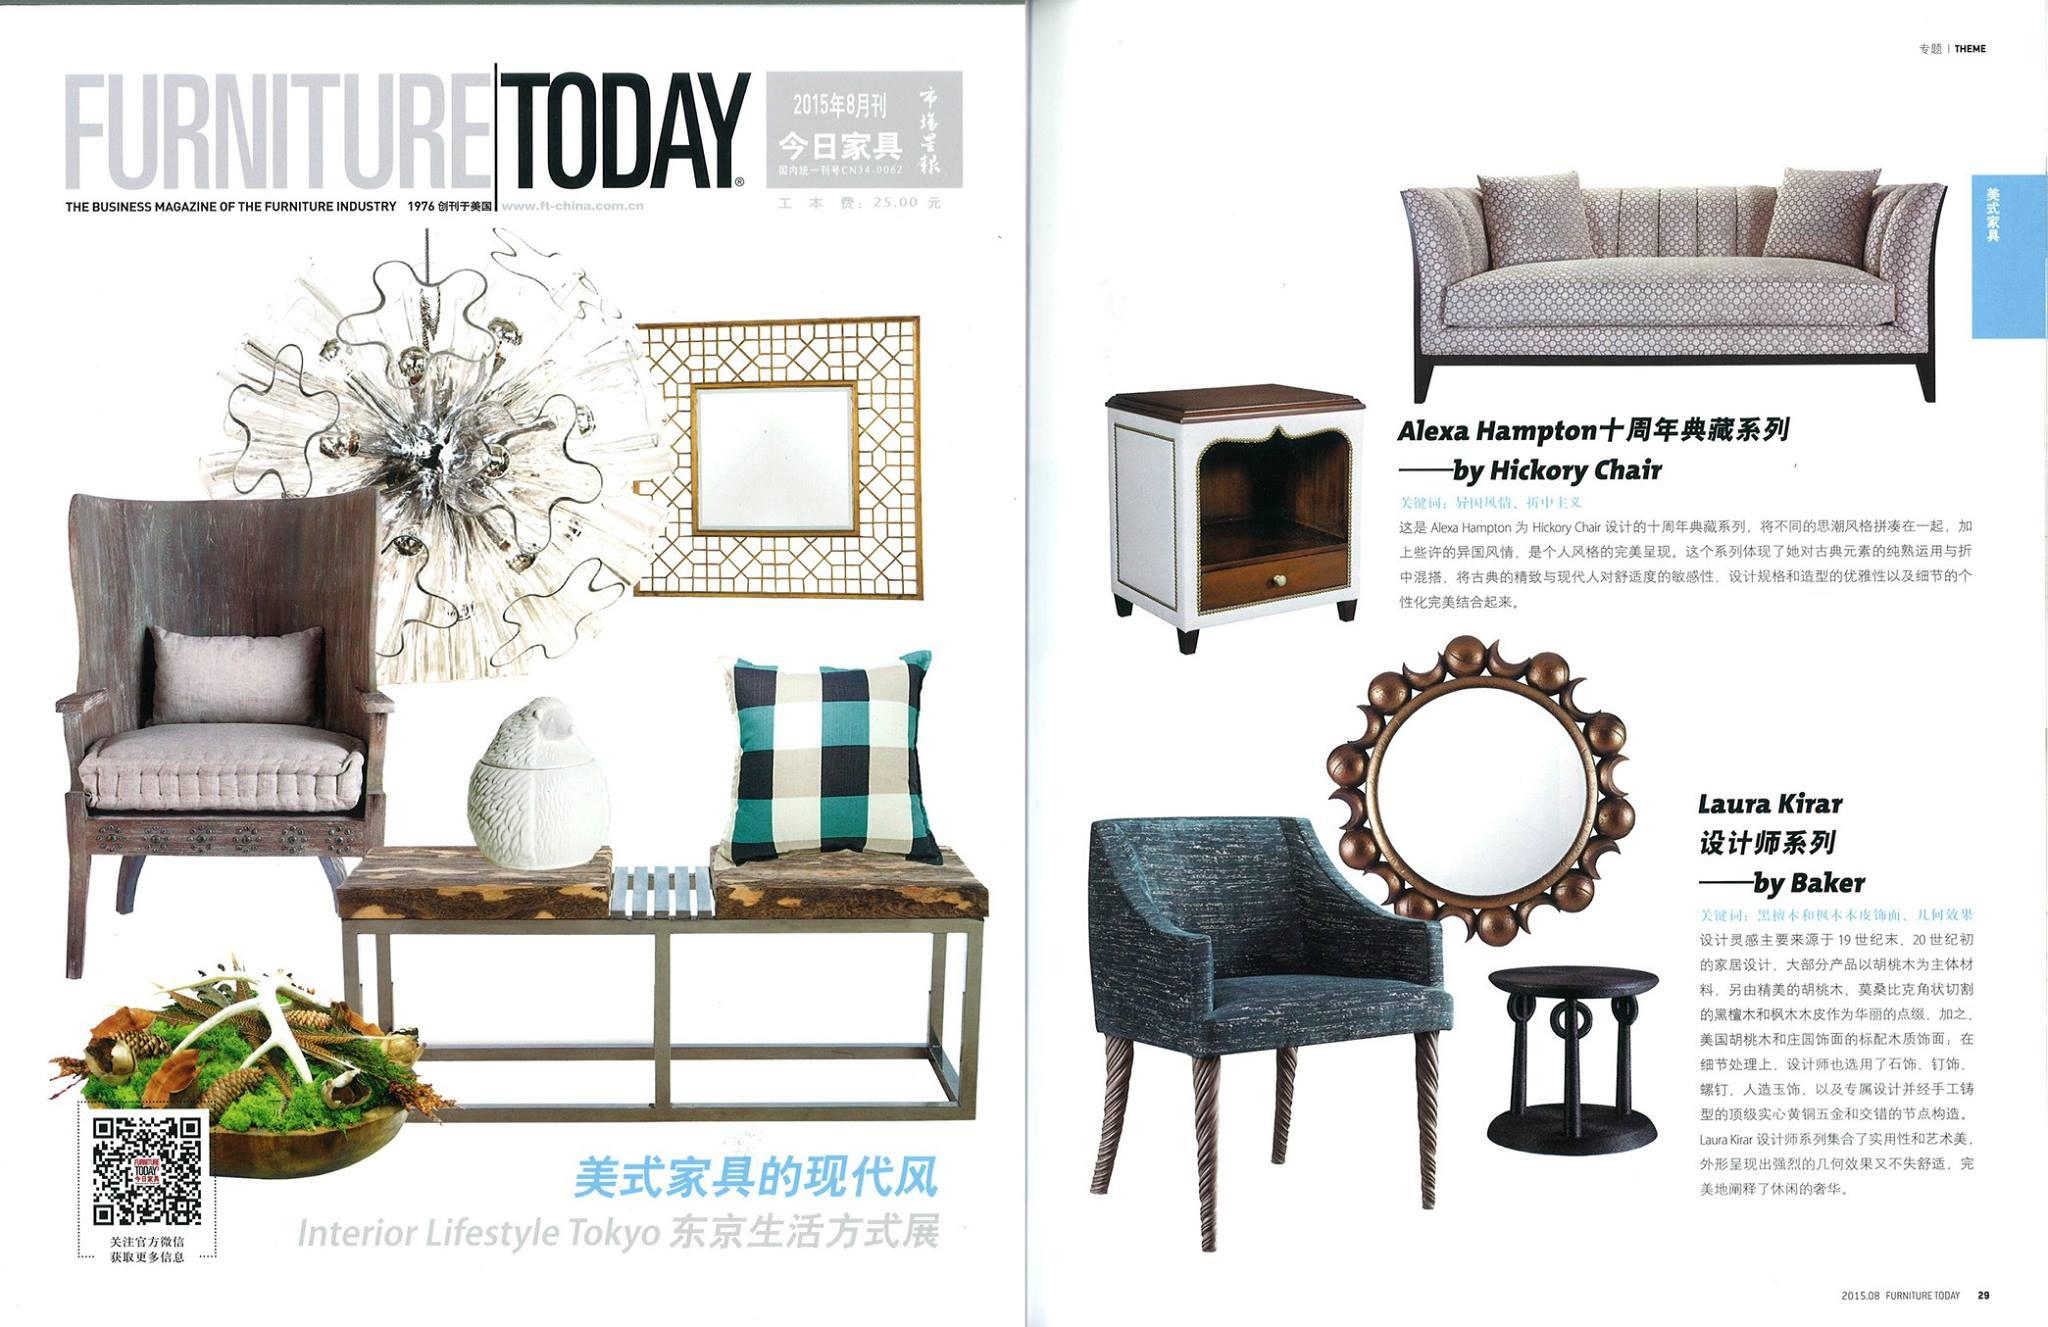 Laura Kirar - Baker - Furniture Today